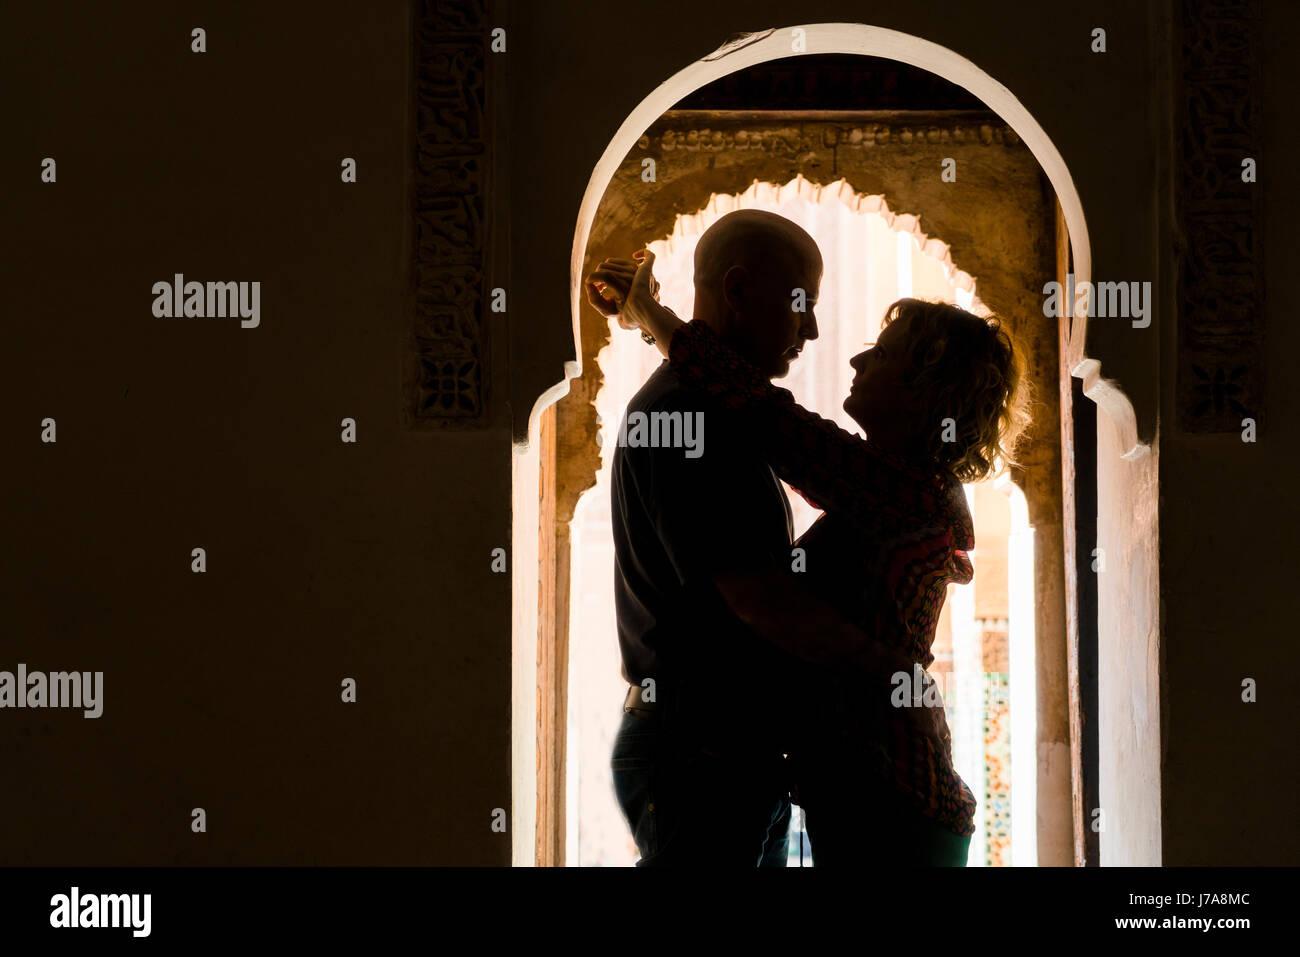 Morocco, Marrakesh, couple hugging in doorframe - Stock Image